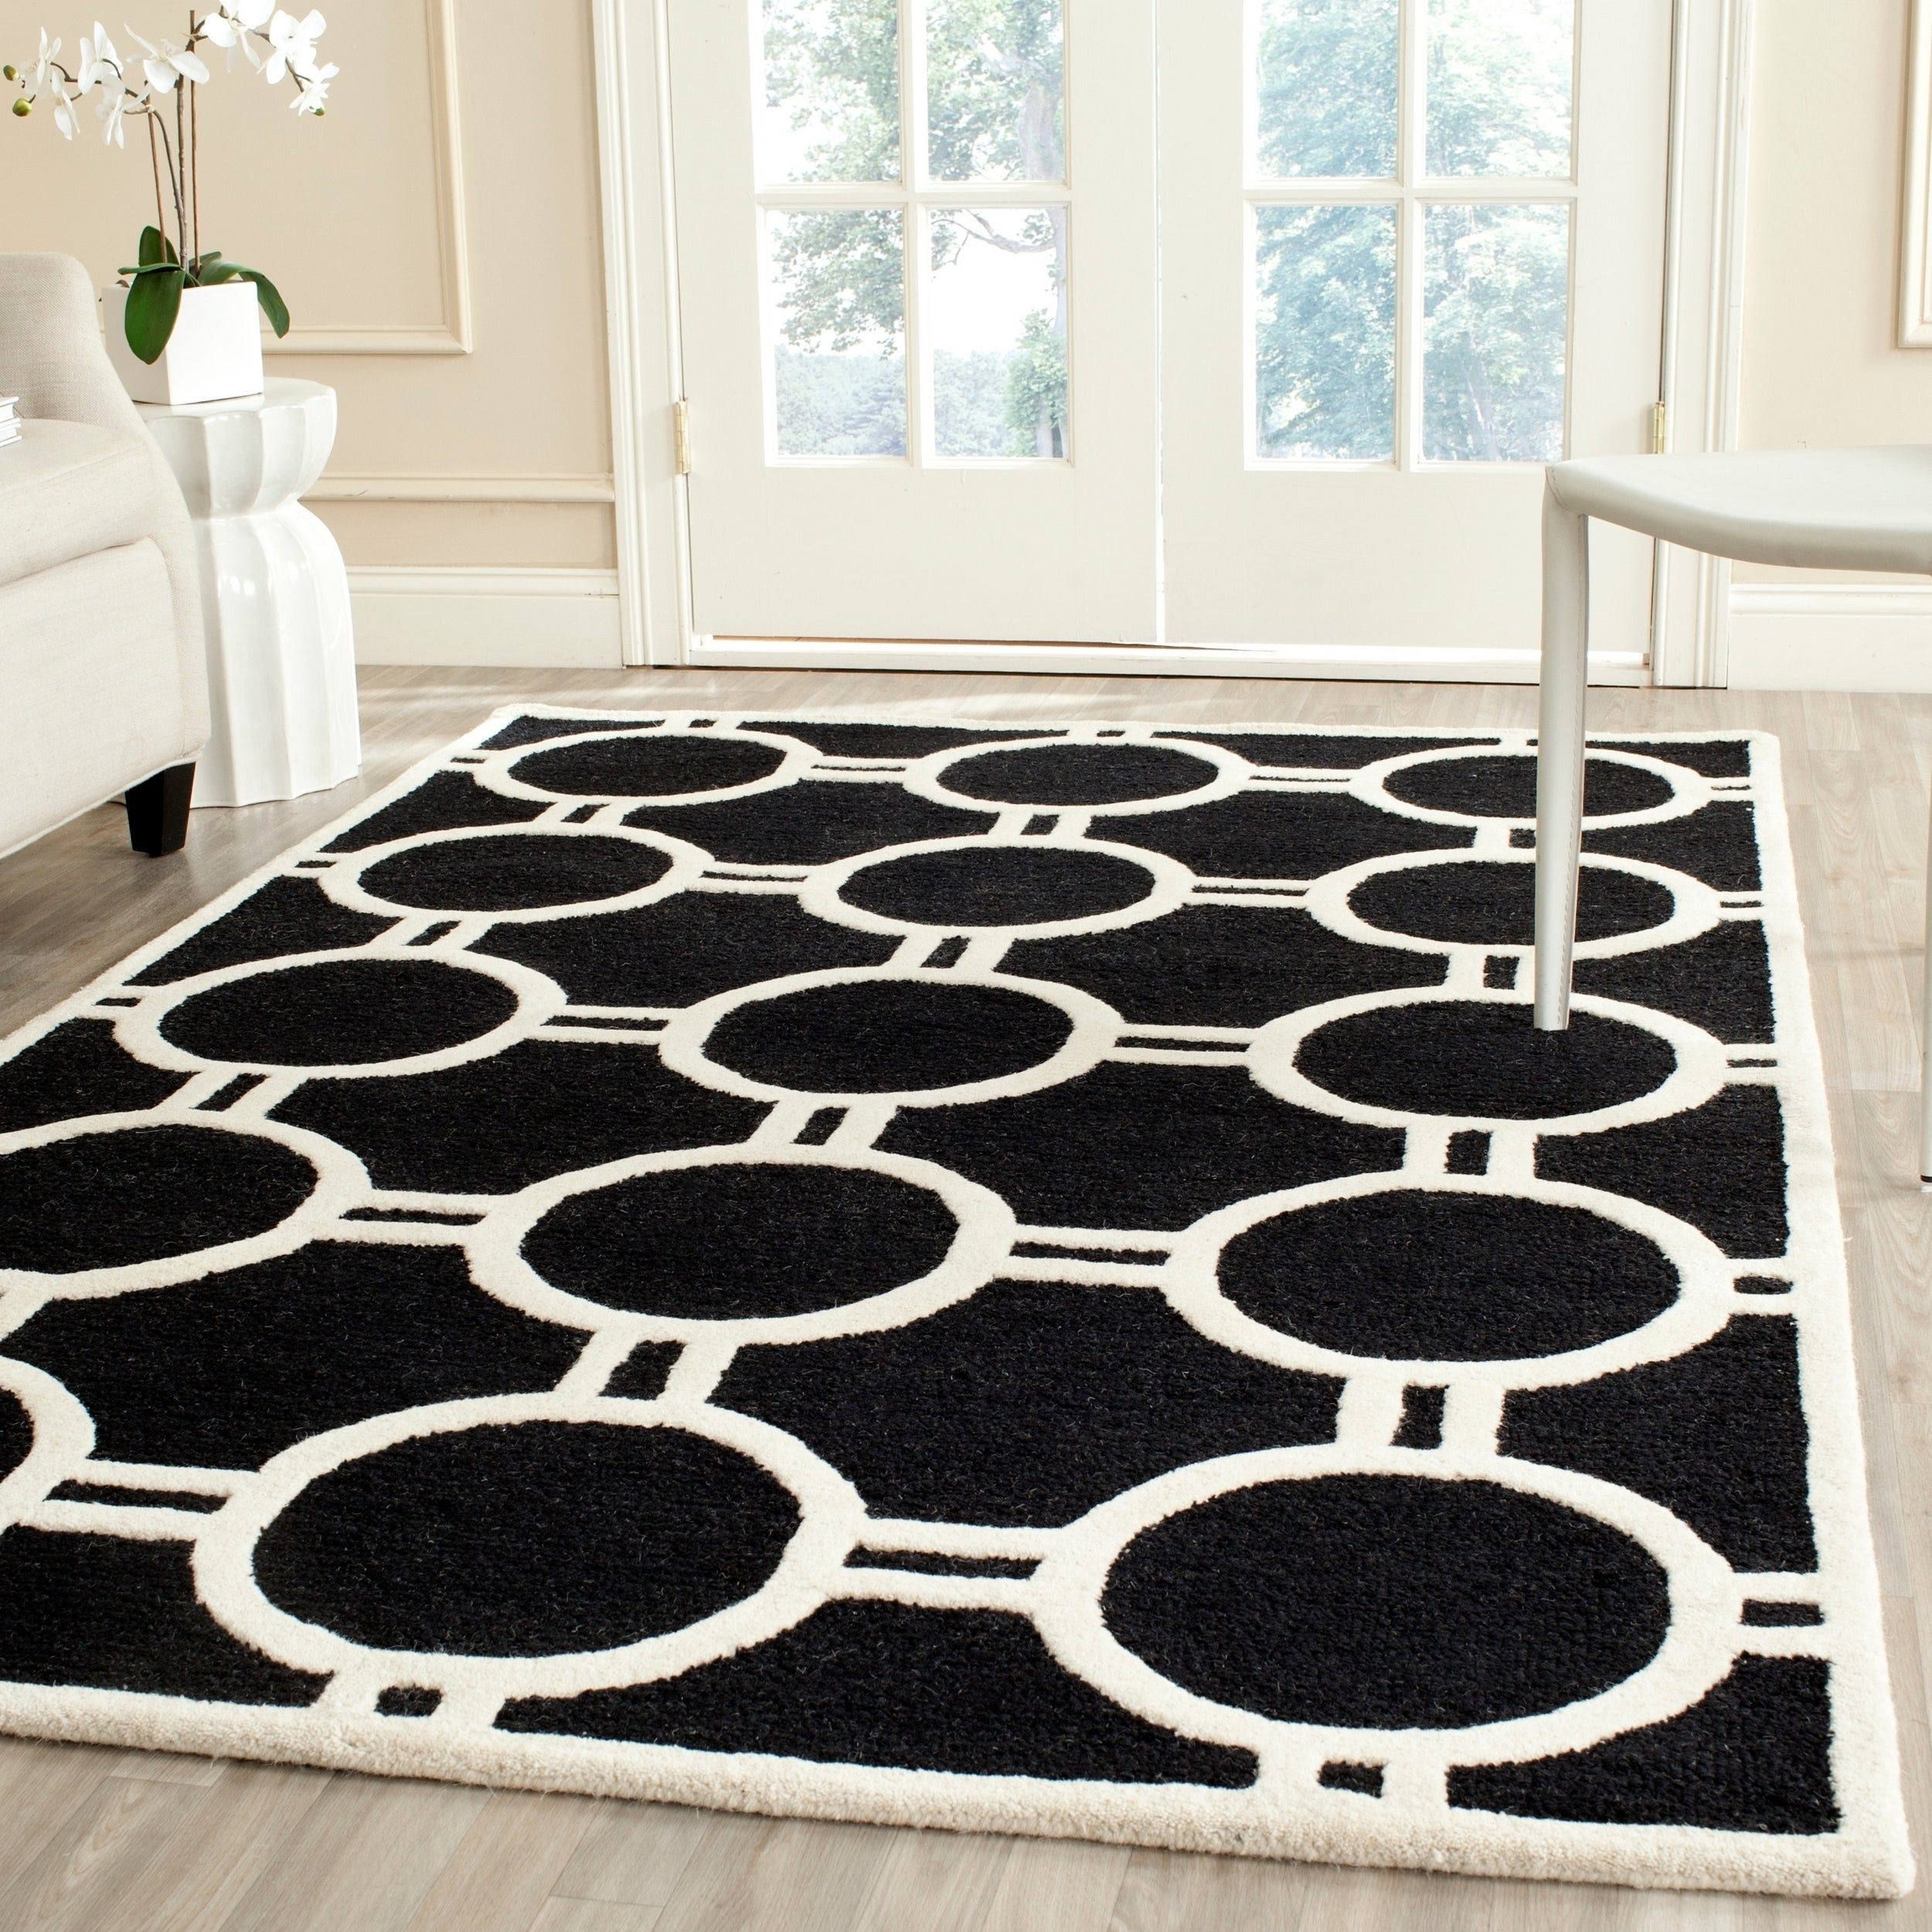 Safavieh Handmade Moroccan Cambridge Black/ Ivory Wool Rug (8' x 10') at Sears.com